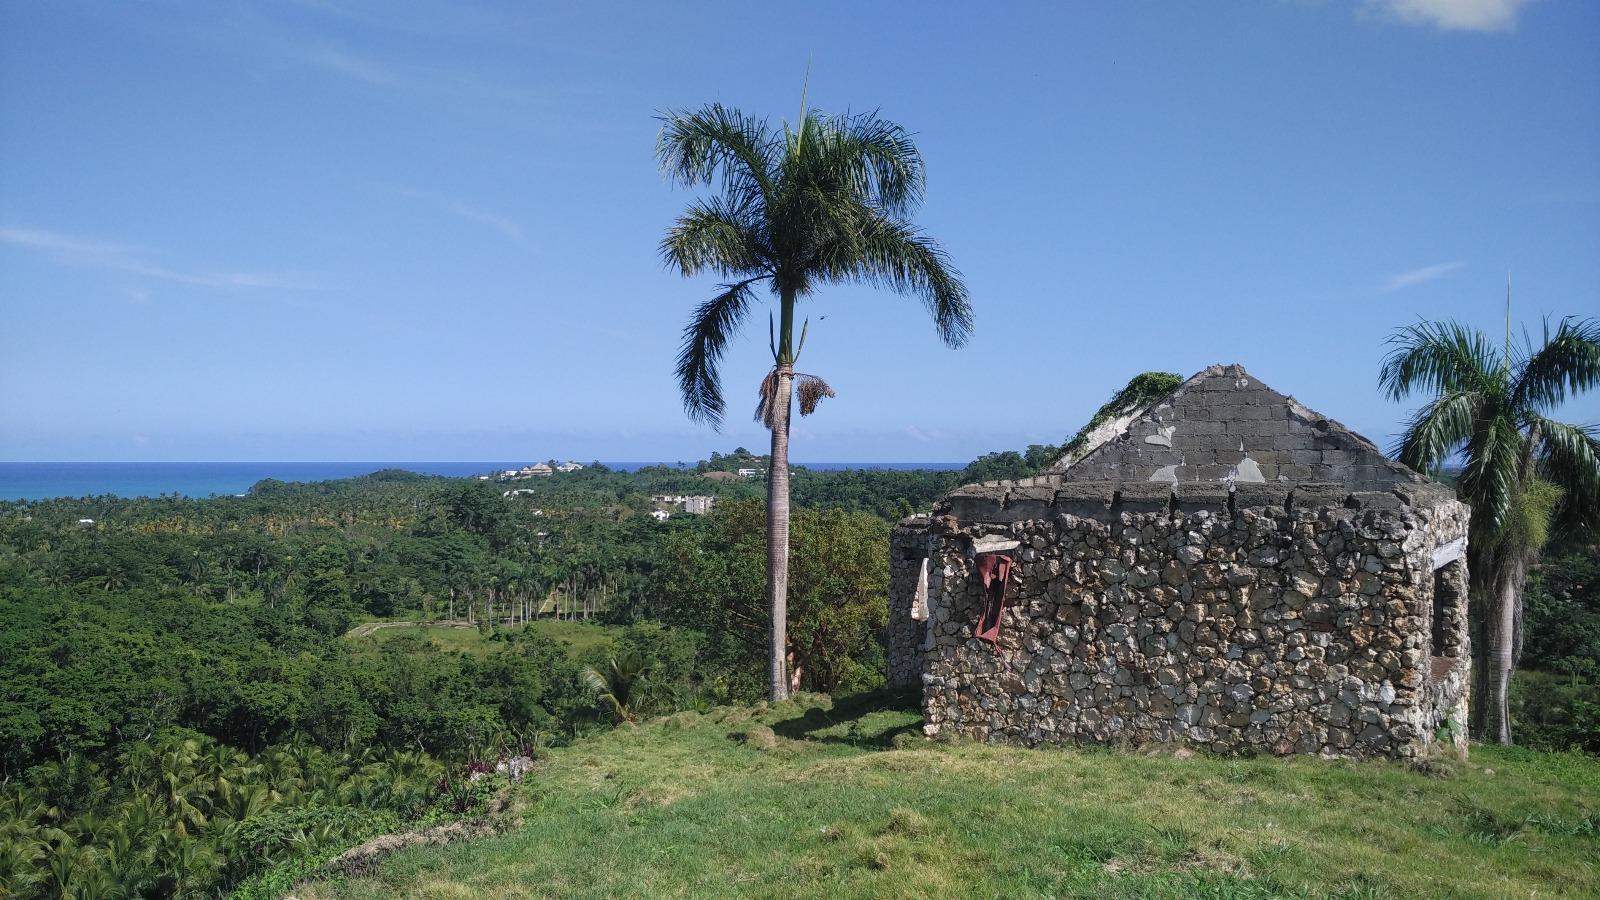 Hill for sale in Las Terrenas Dominican republic 12.jpeg